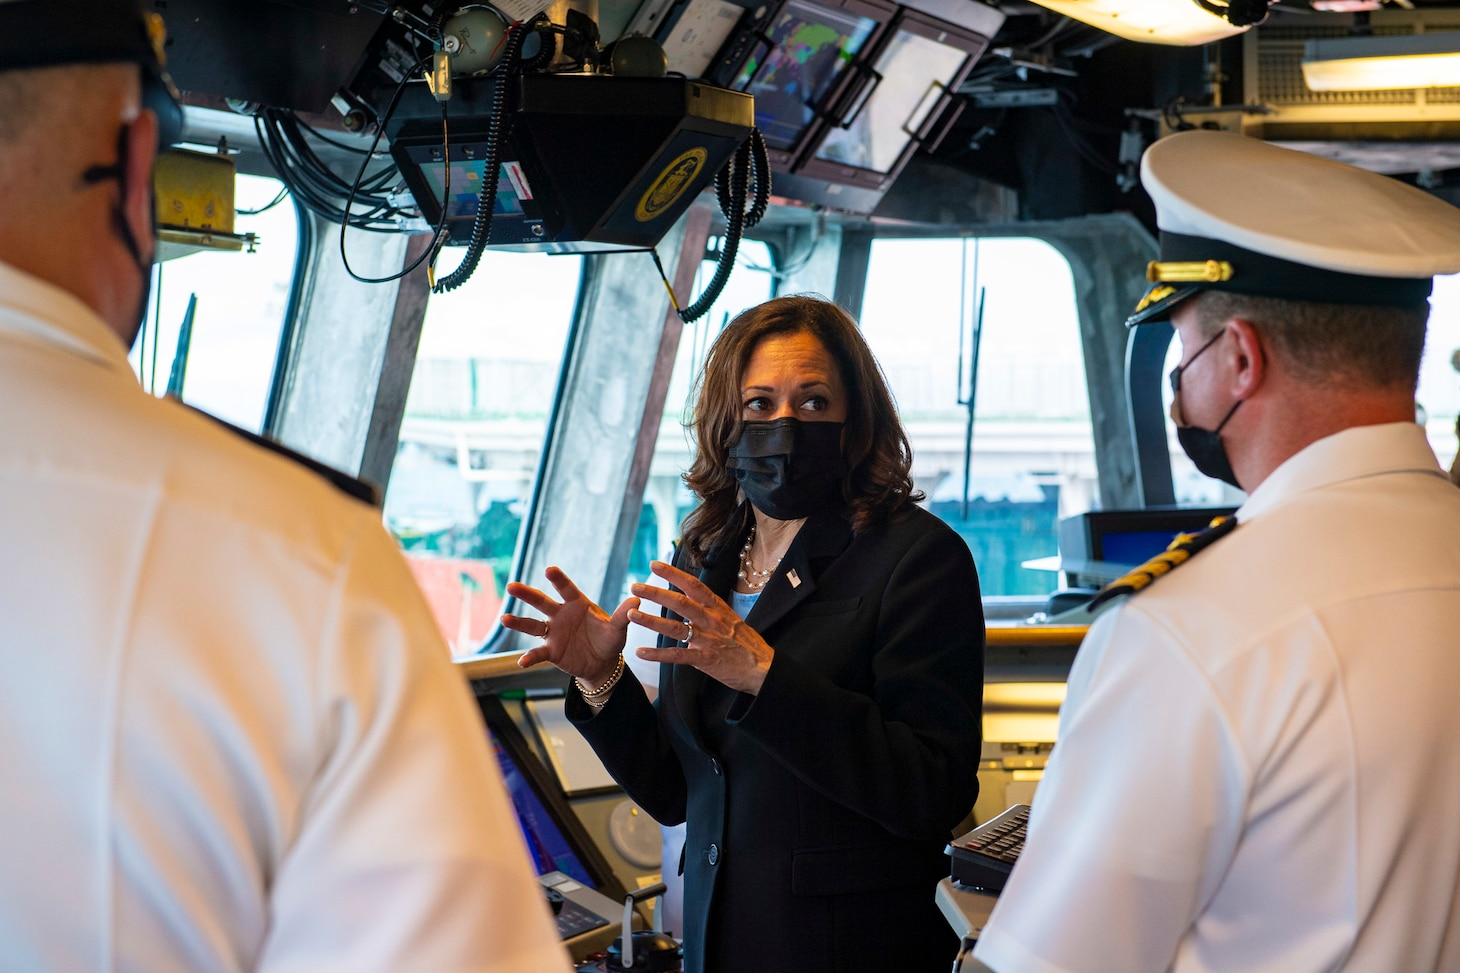 Vice President Kamala Harris visits the Independence-variant littoral combat ship USS Tulsa (LCS 16), Aug. 23, 2021.